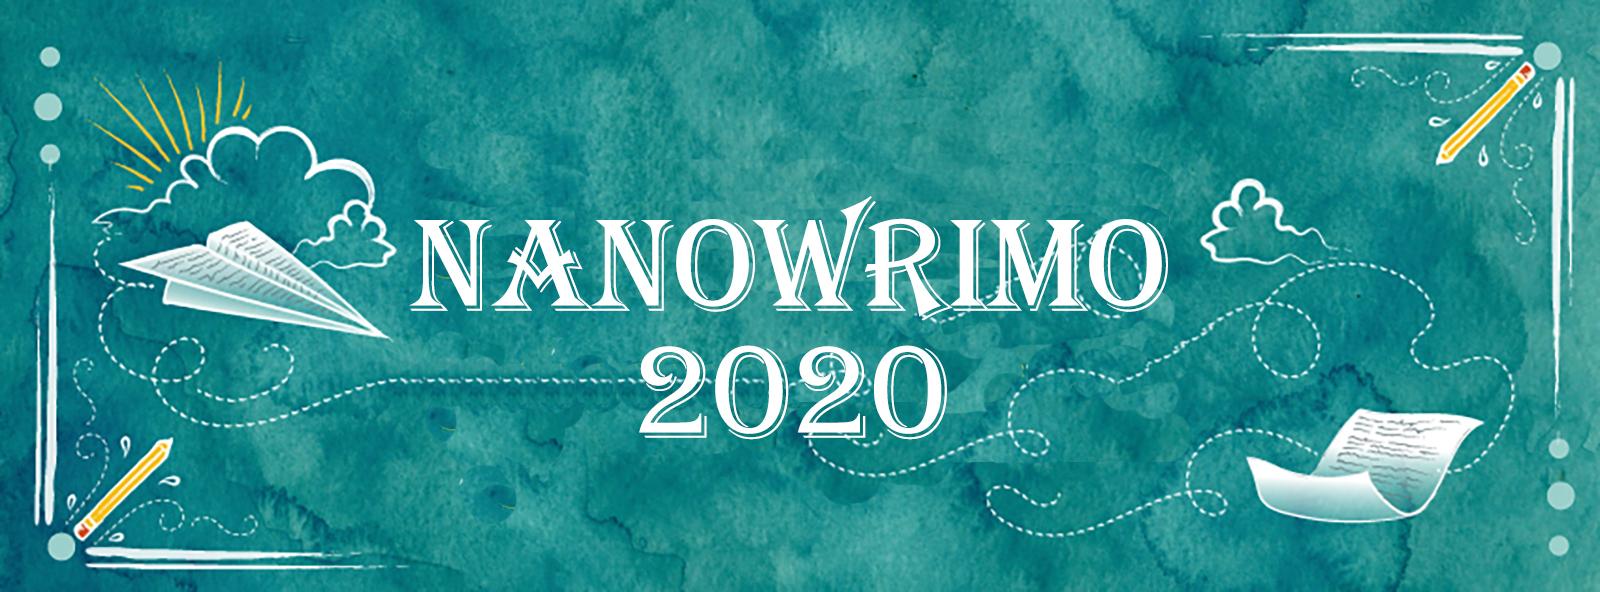 nanowrimo-2020